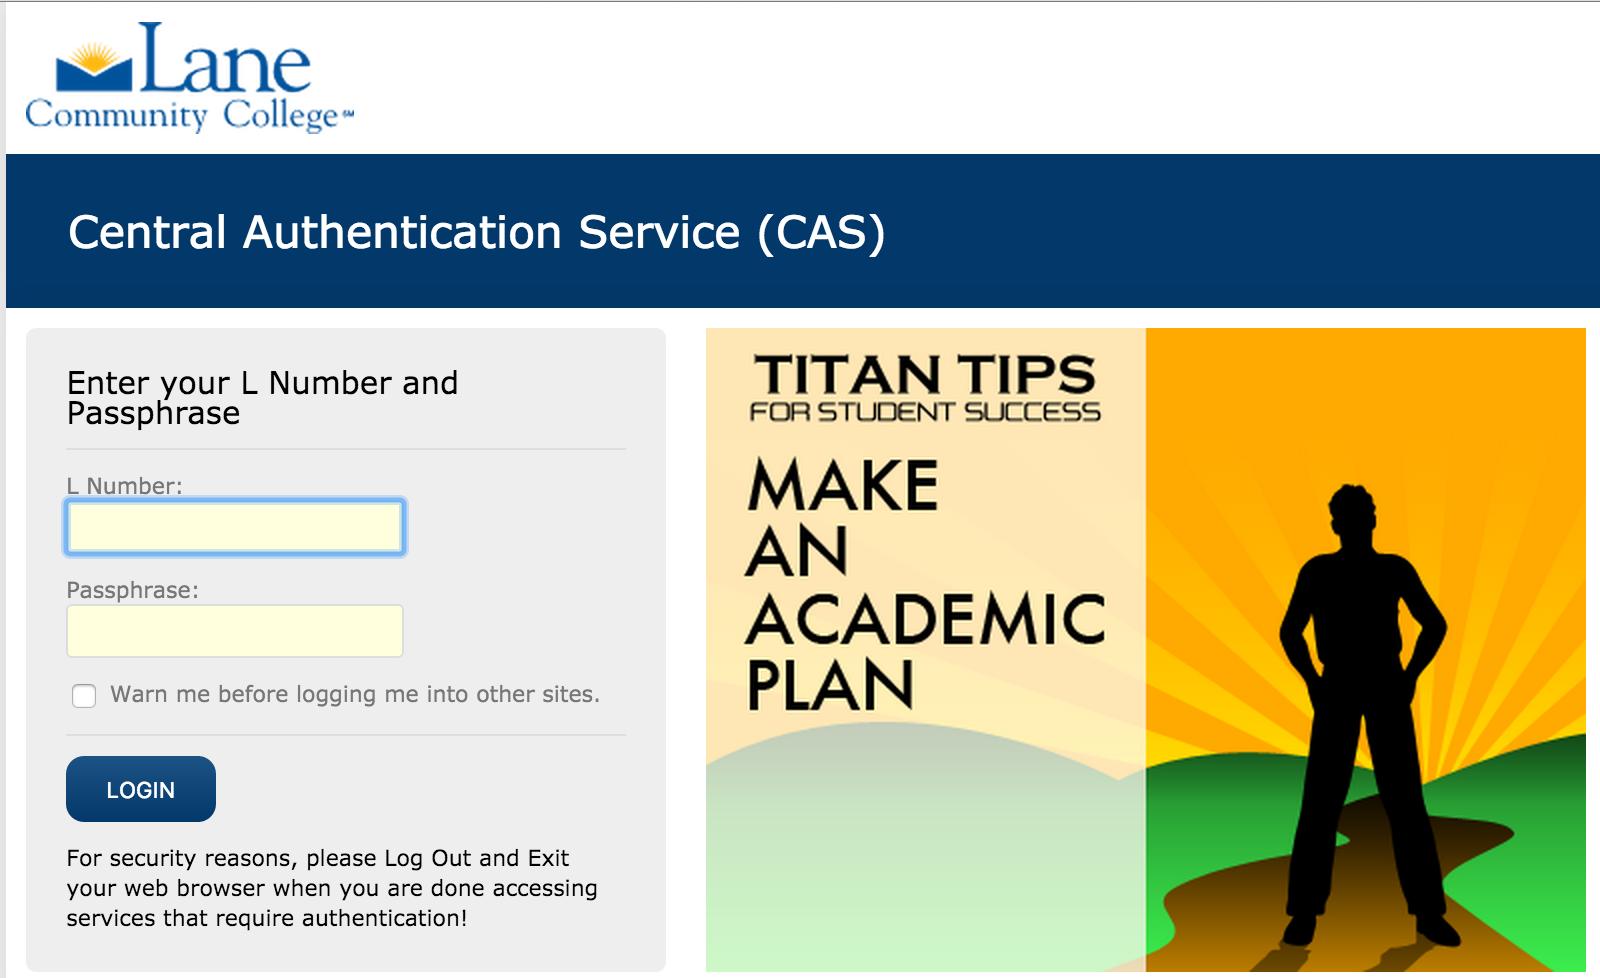 Screenshot of the CAS login screen